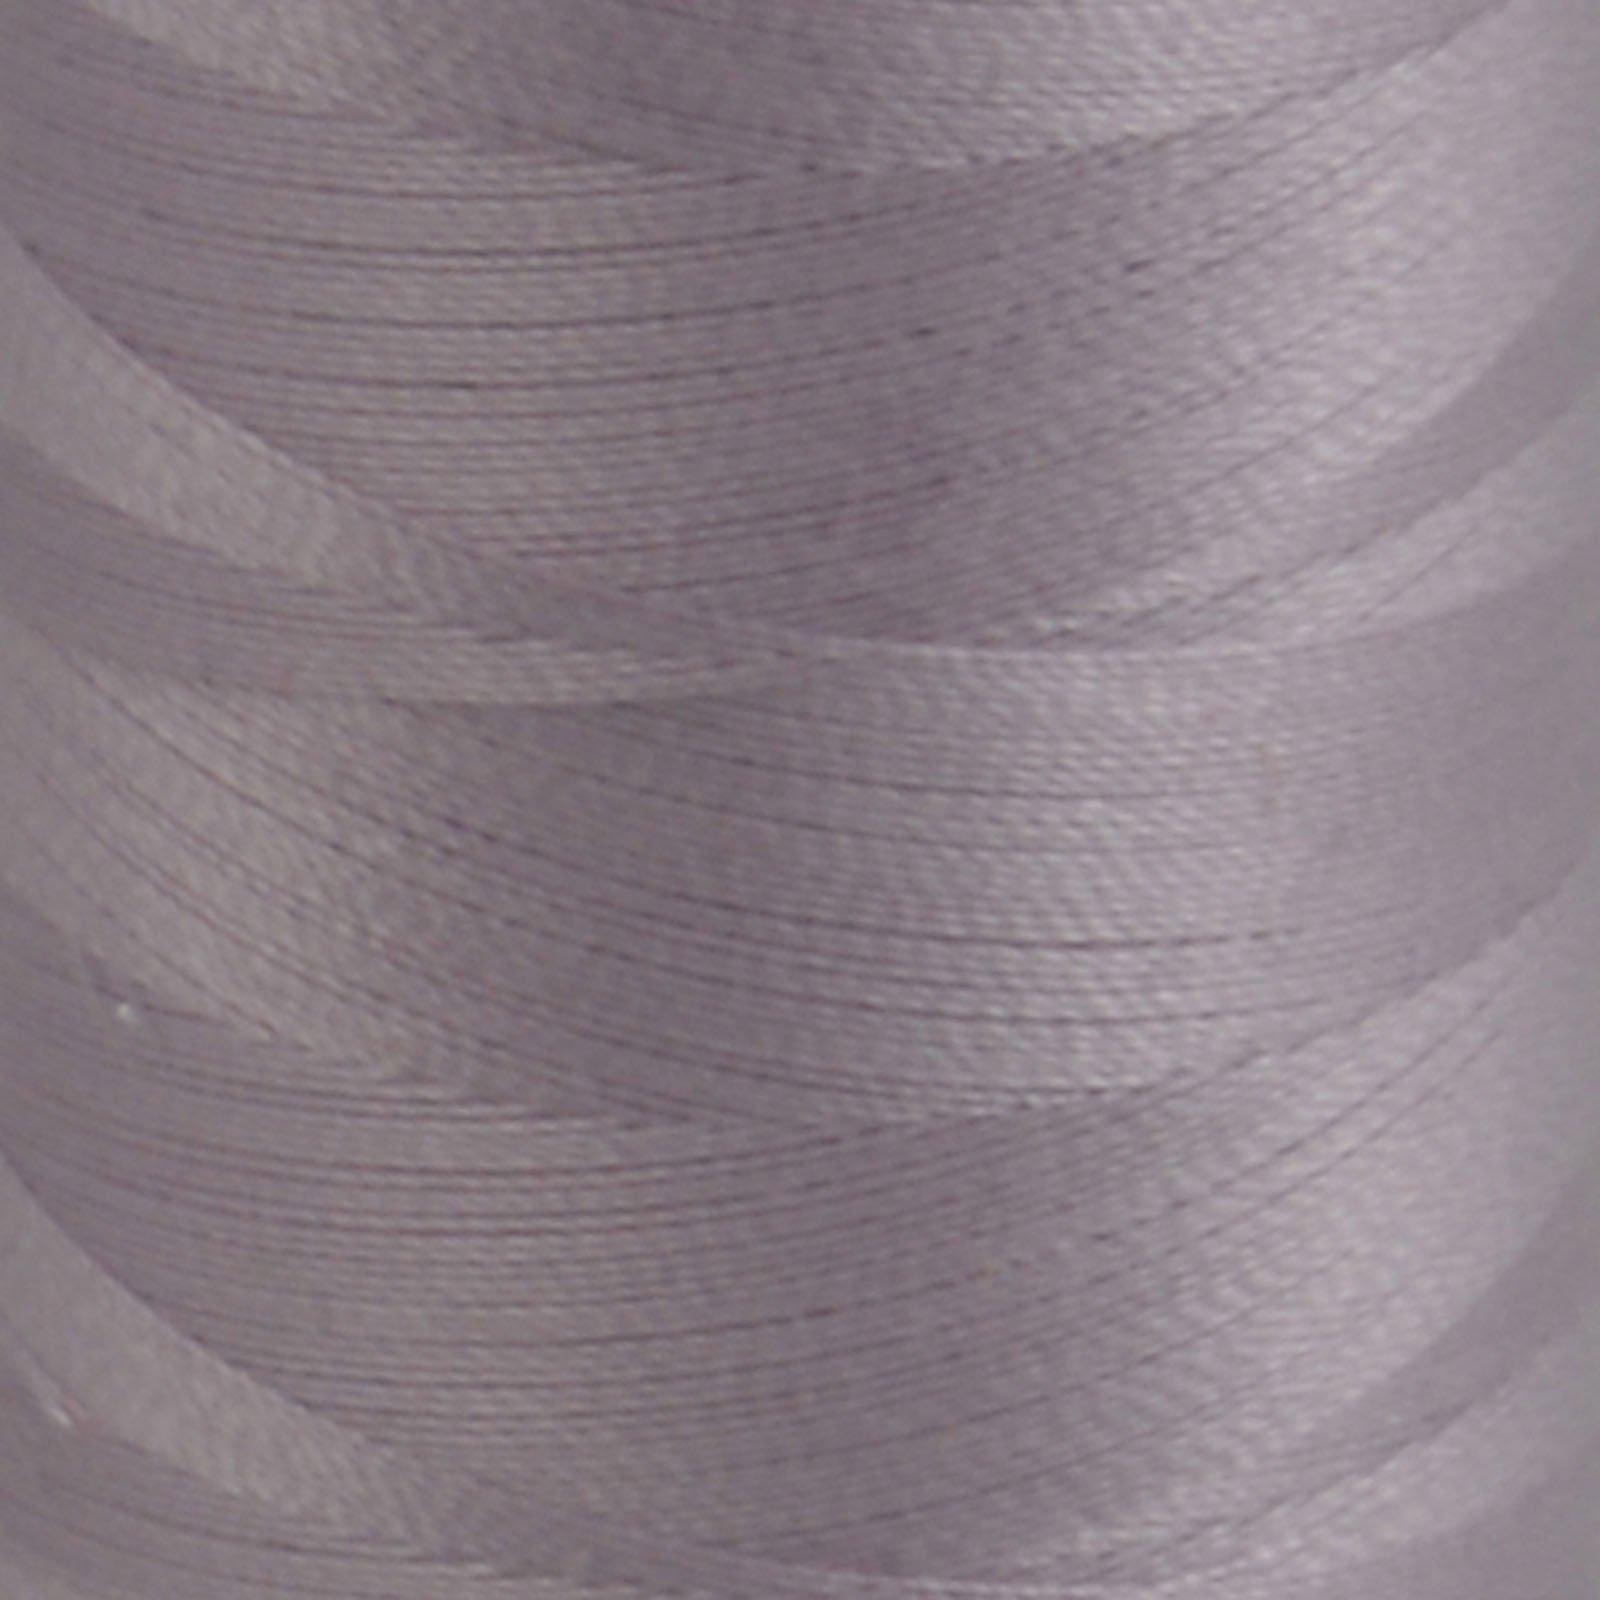 # 2564 Pale Lilac